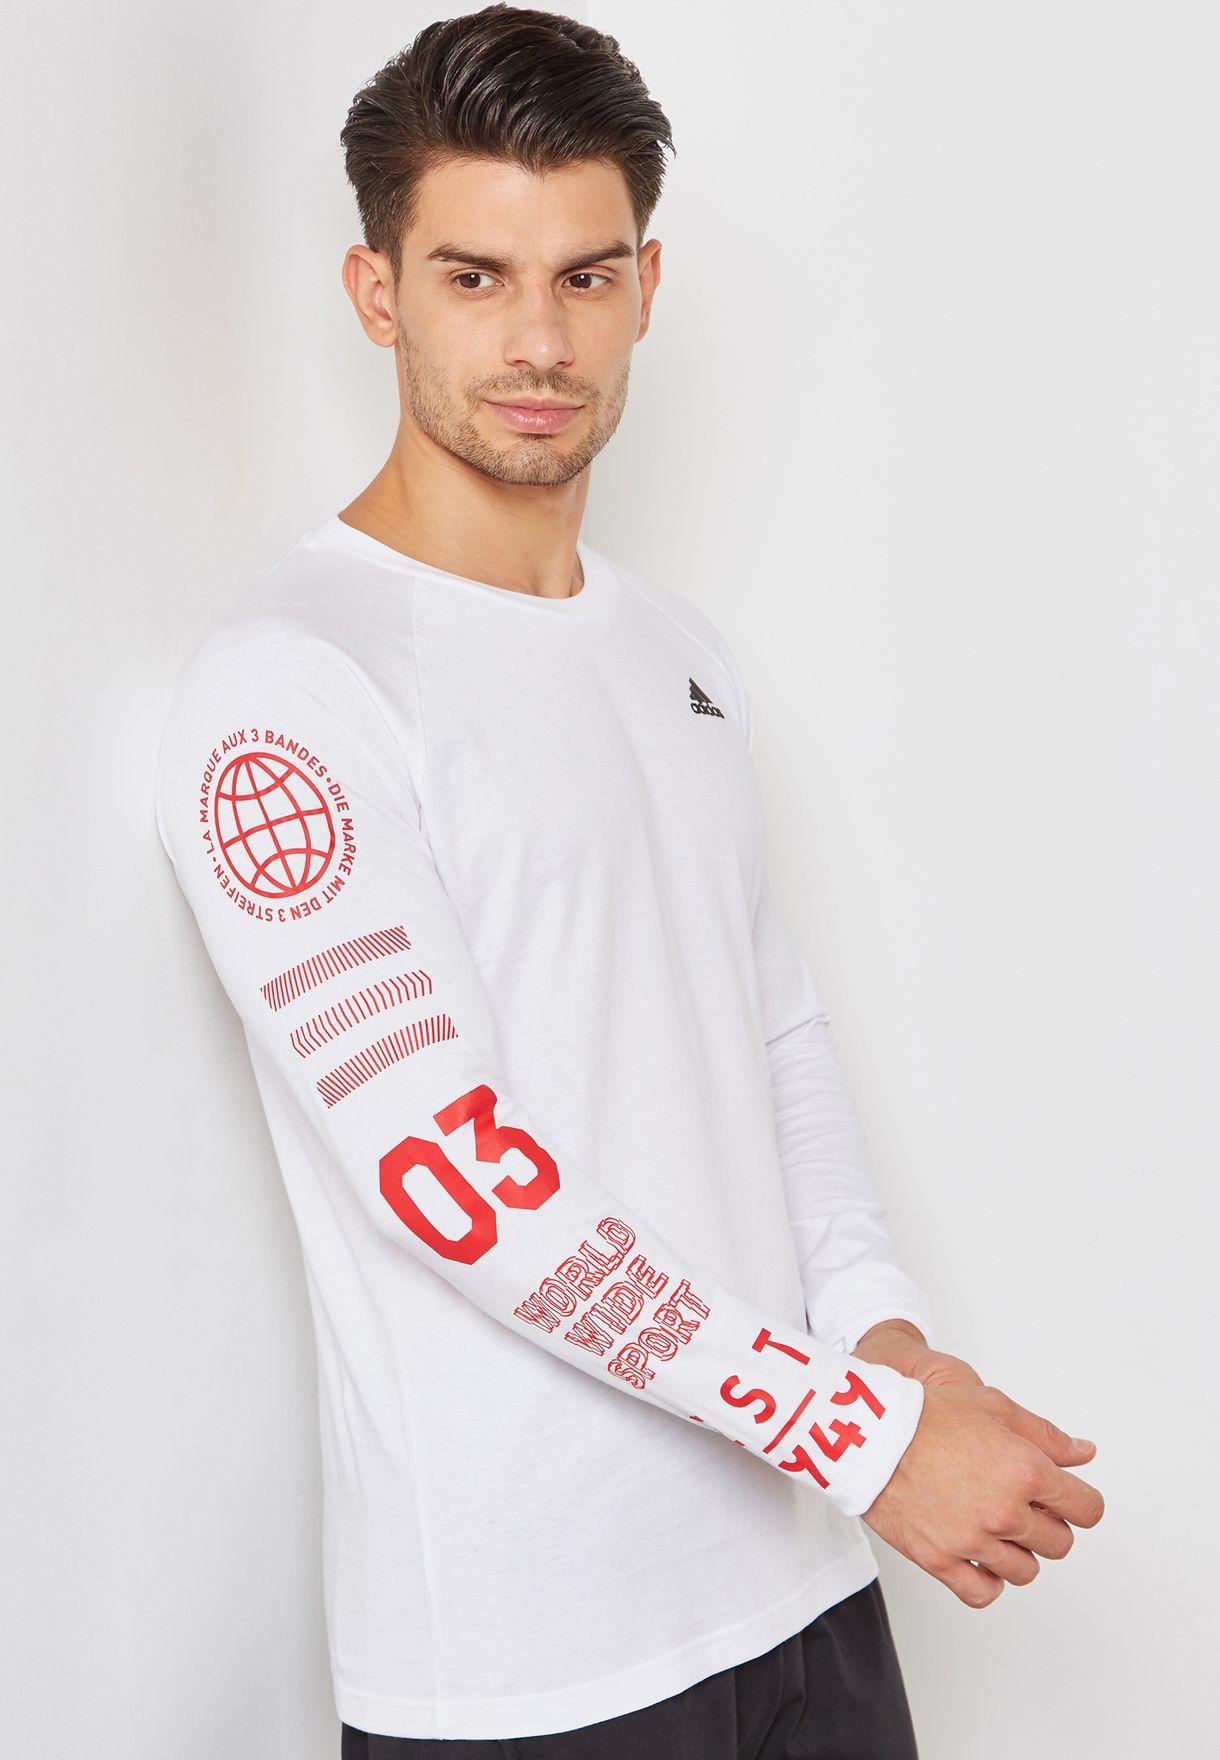 61c92b5fd3bda Shop adidas white Badge T-Shirt DI0319 for Men in UAE - AD476AT06KLX